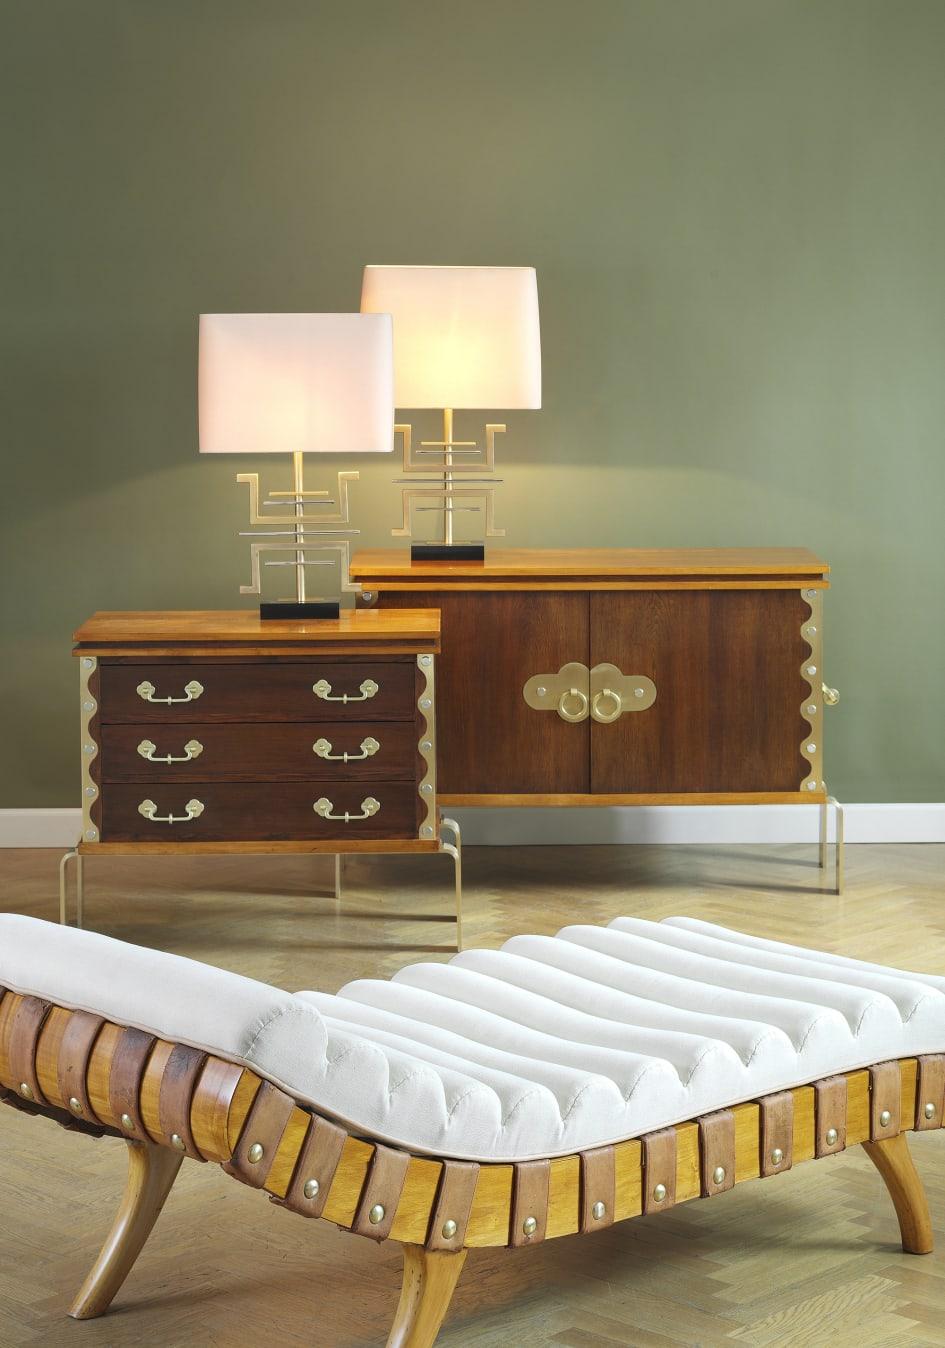 Dkk 420 000 For Hitherto Unknown Art Deco Furniture Bruun